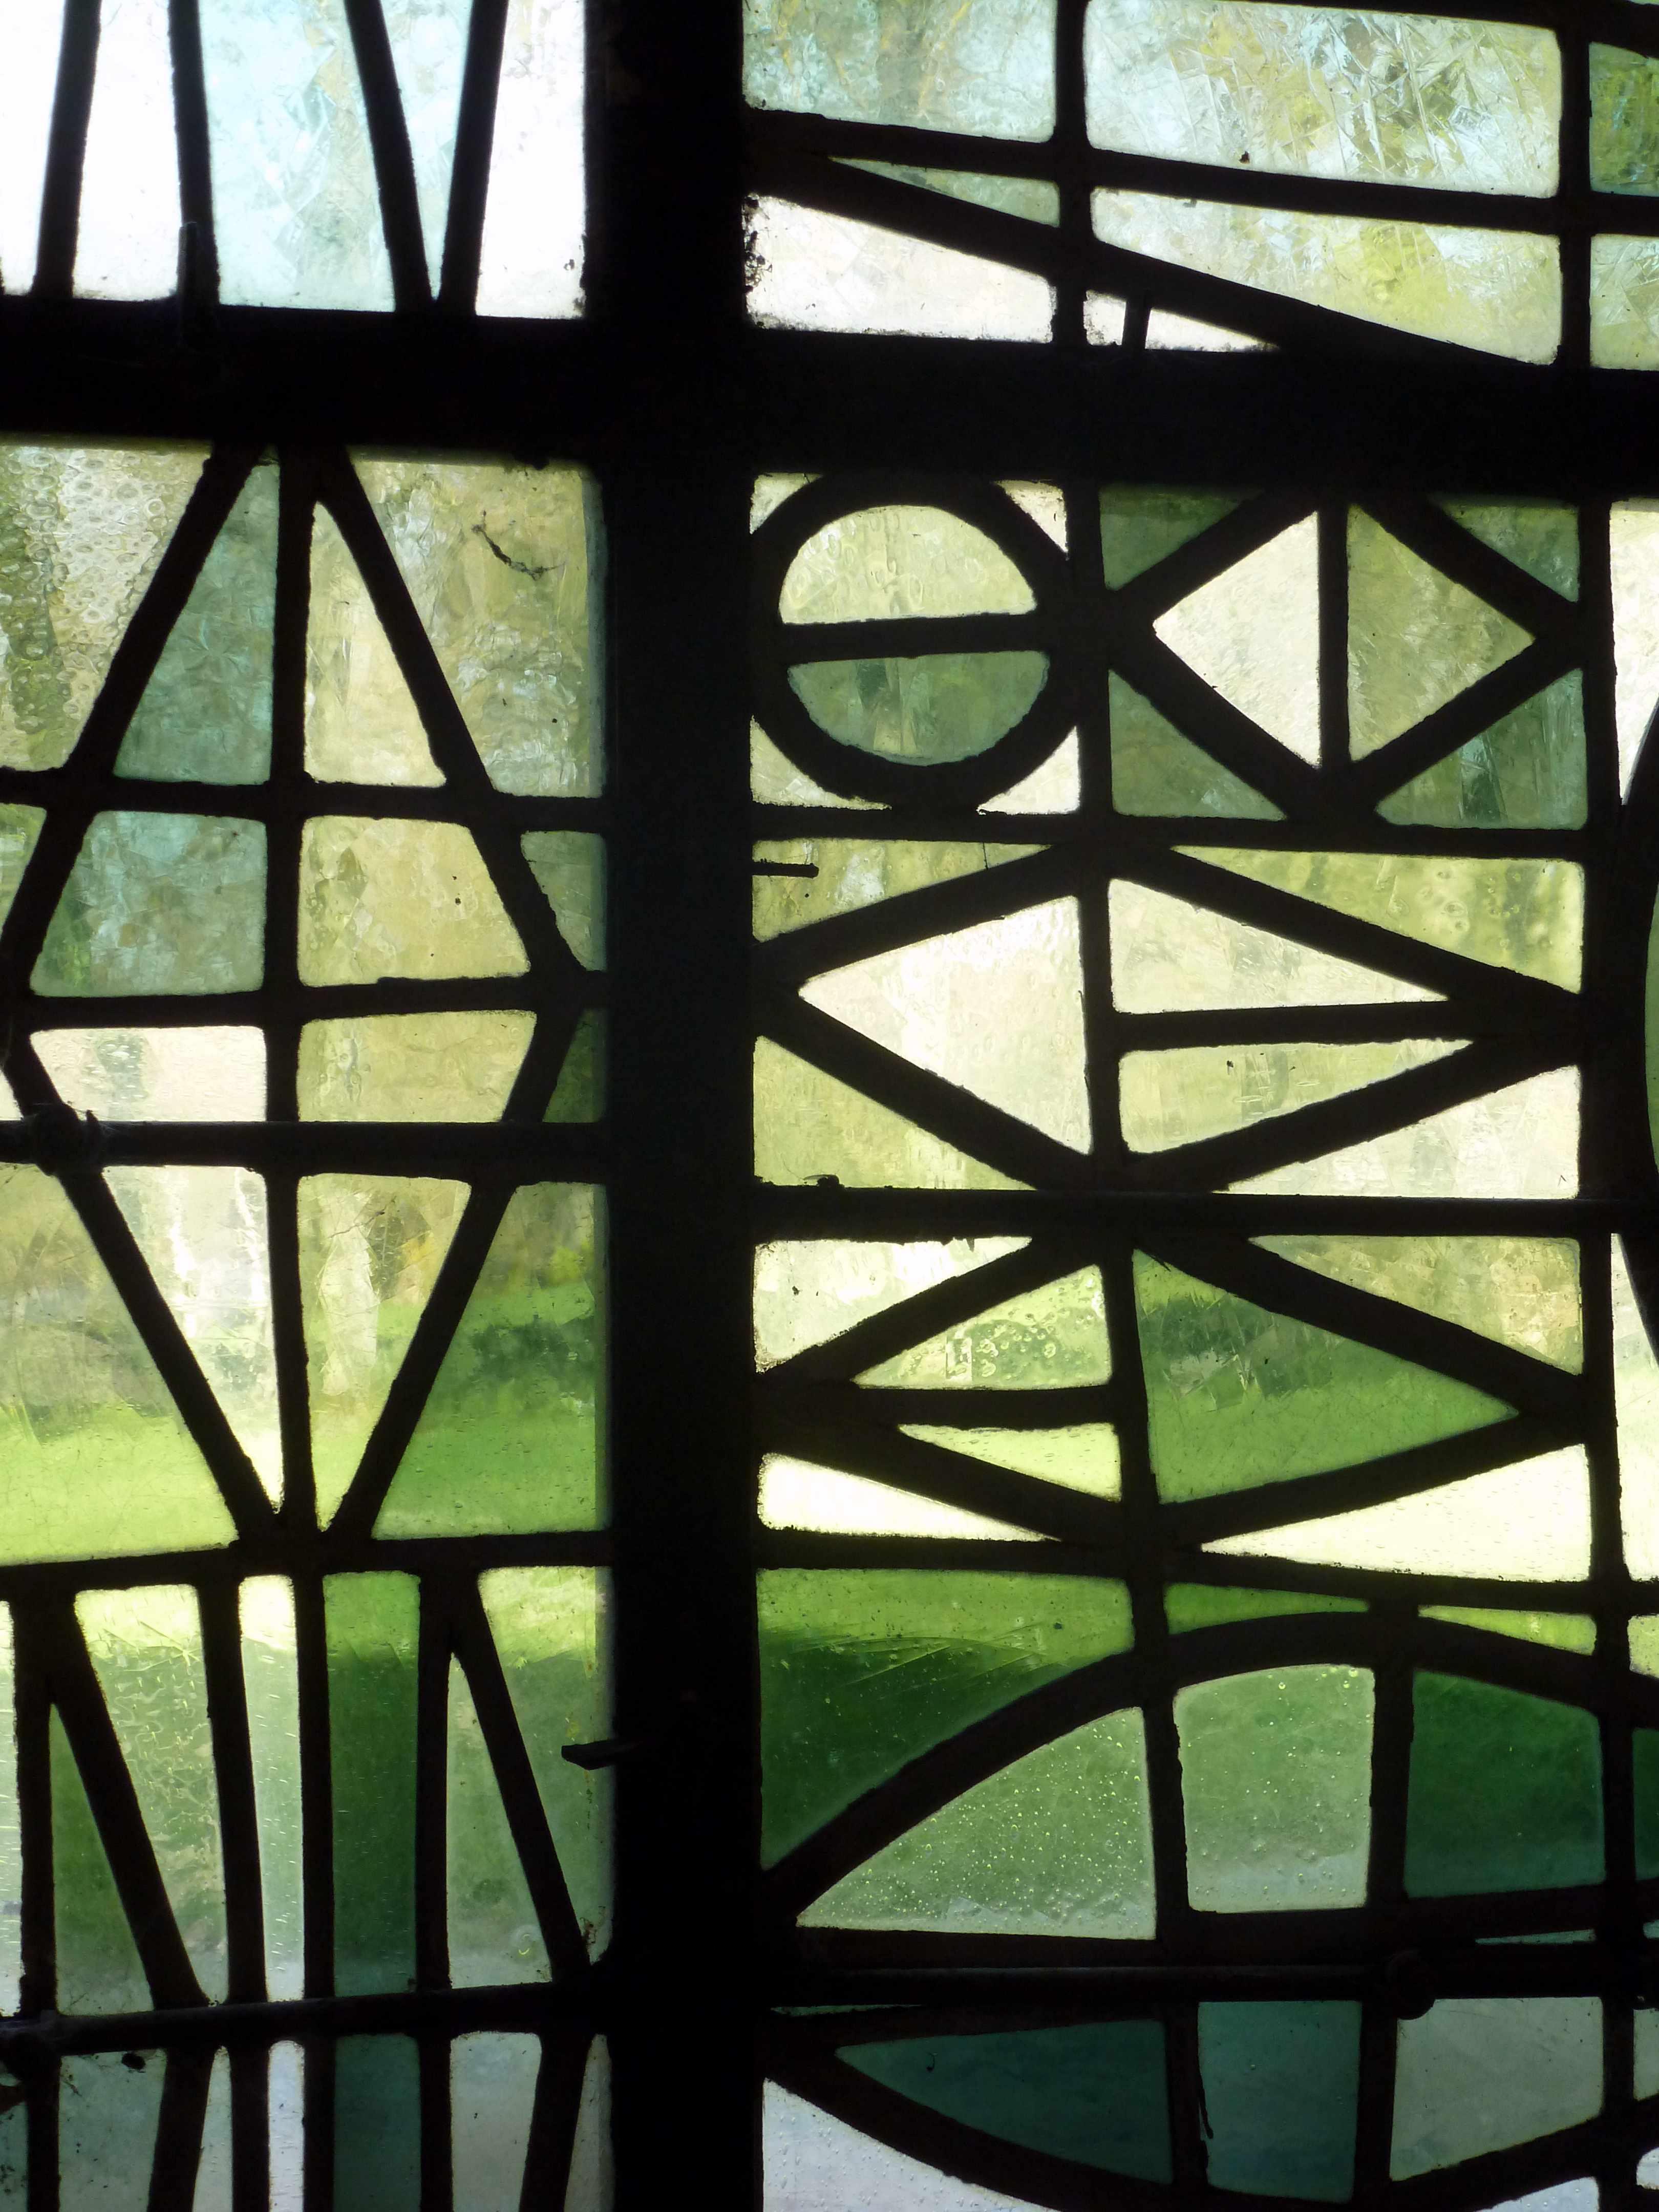 Abbaye Vaucelles salle capitulaire vitrail detail Gerard Lardeur